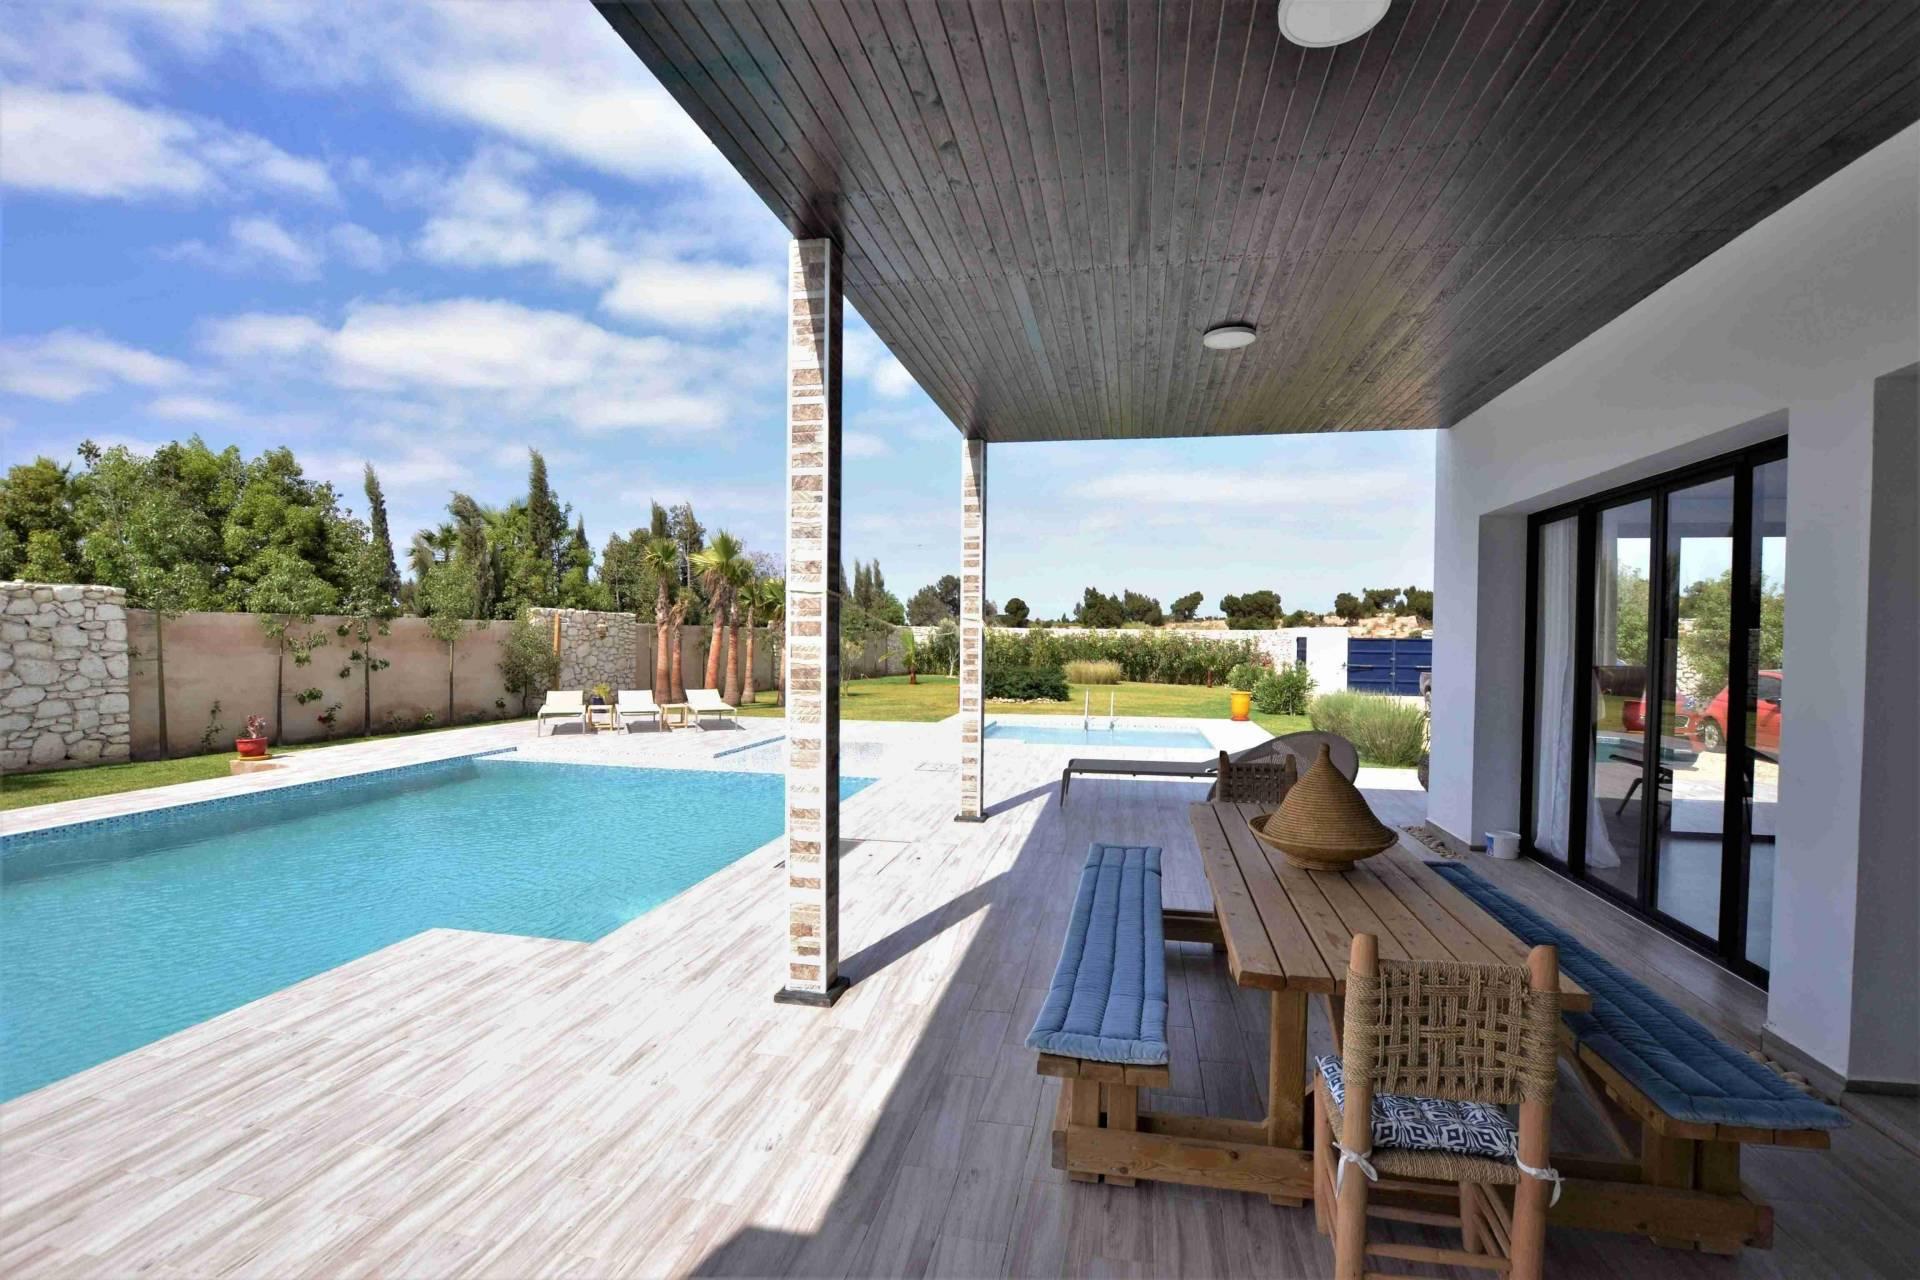 Vente - Maison de campagne - Campagne - 200 m² - 350000 € - Essaouira - 9213